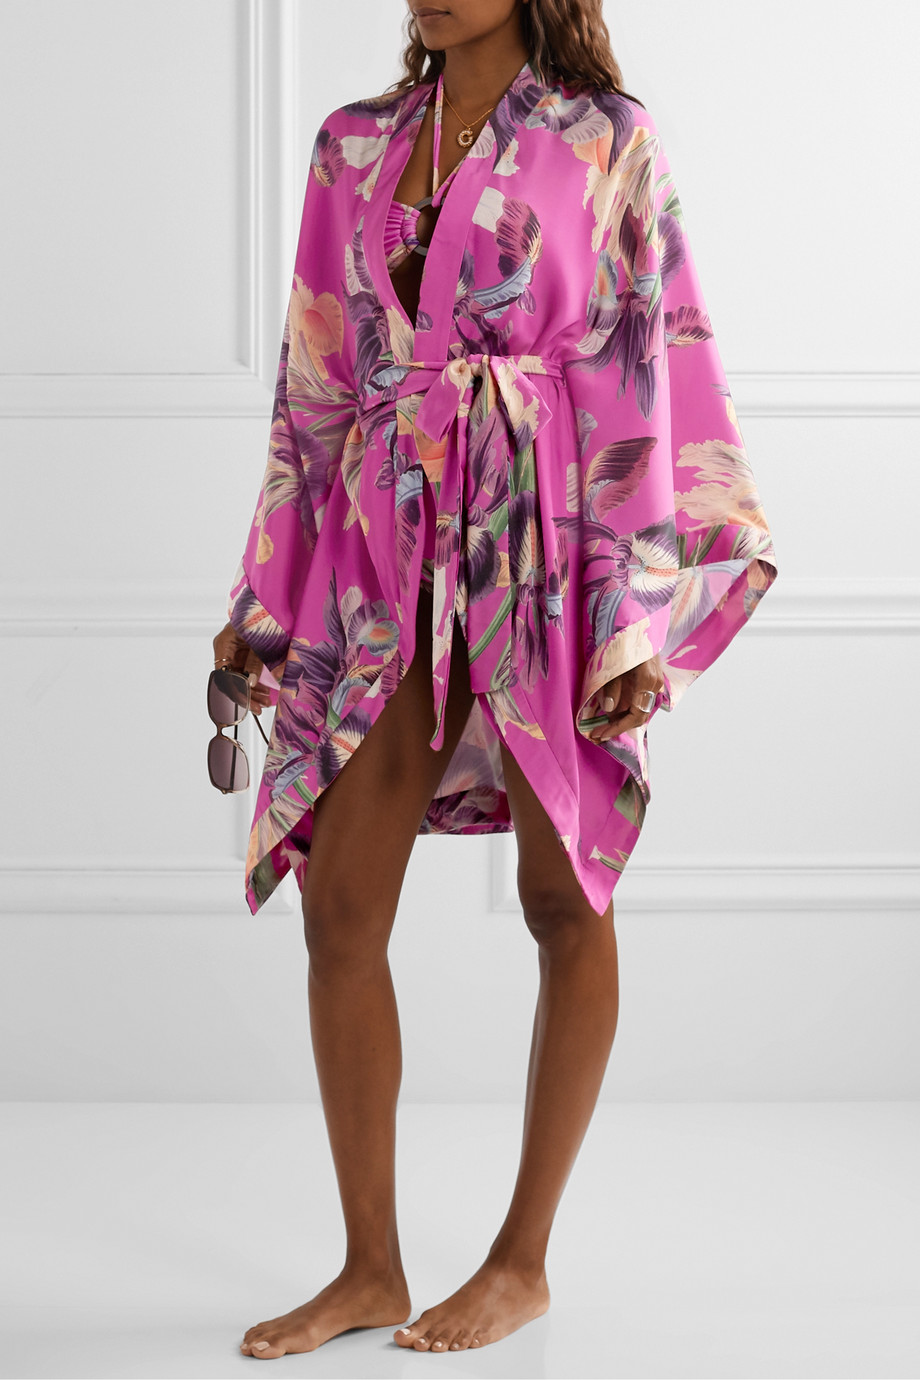 PatBO Grace floral-print charmeuse kimono